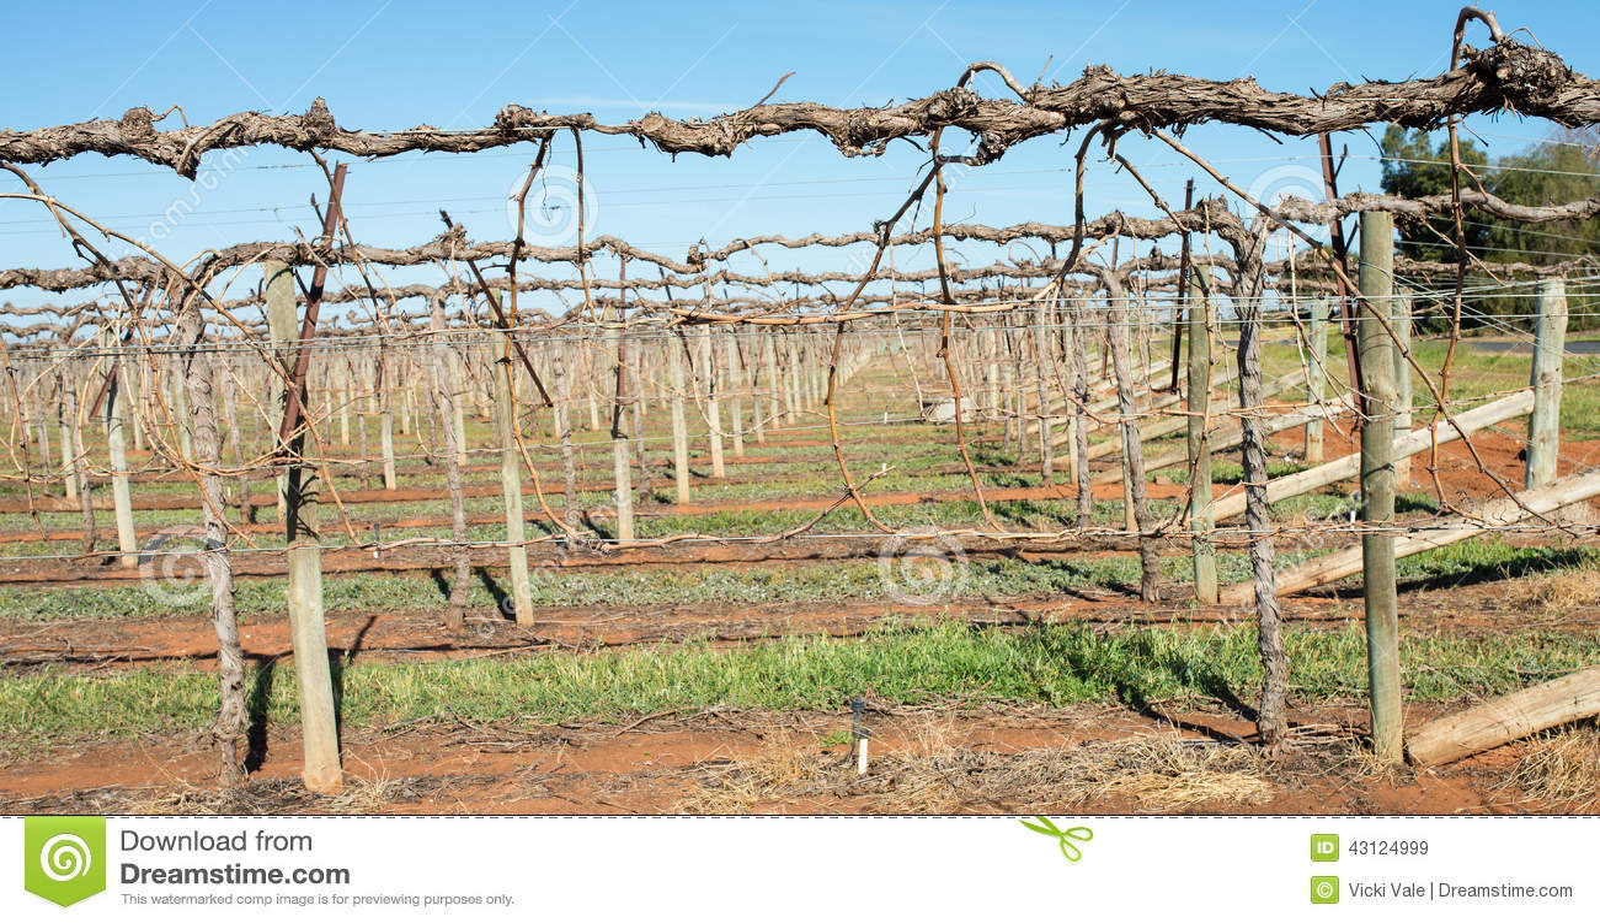 Shaw Swing Arm Trellis Grape Vines Stock Image Image of grape